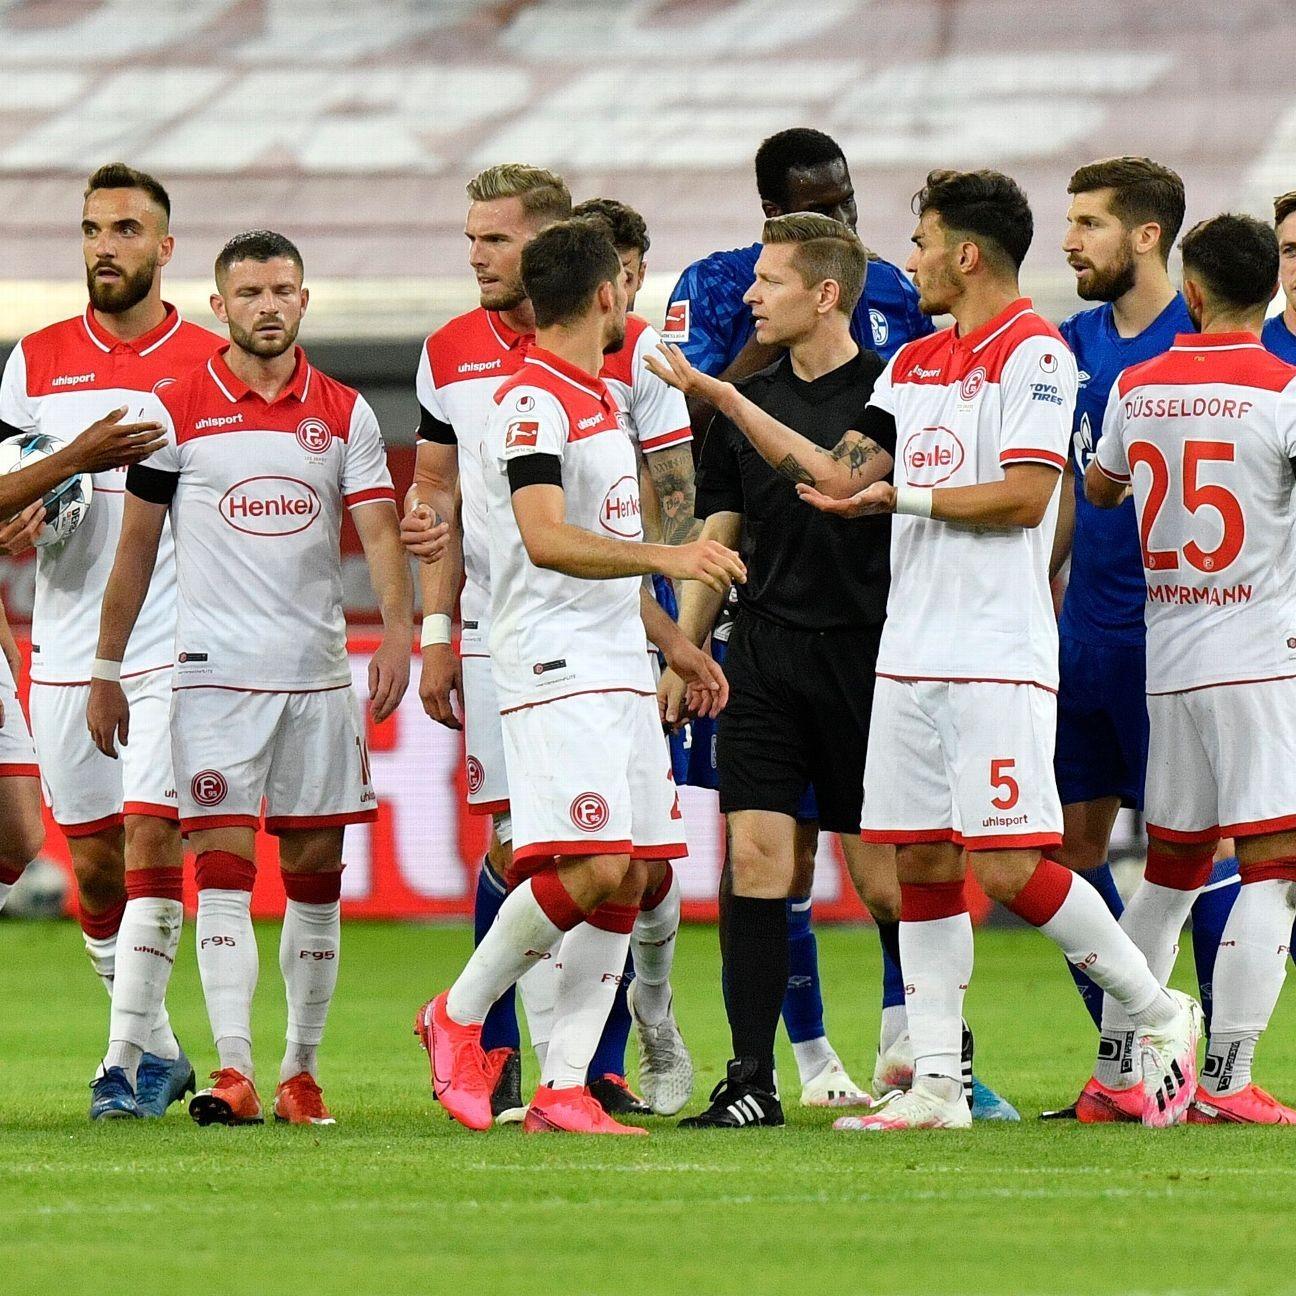 Fortuna Dusseldorf boost survival hopes with 2-1 win over Schalke